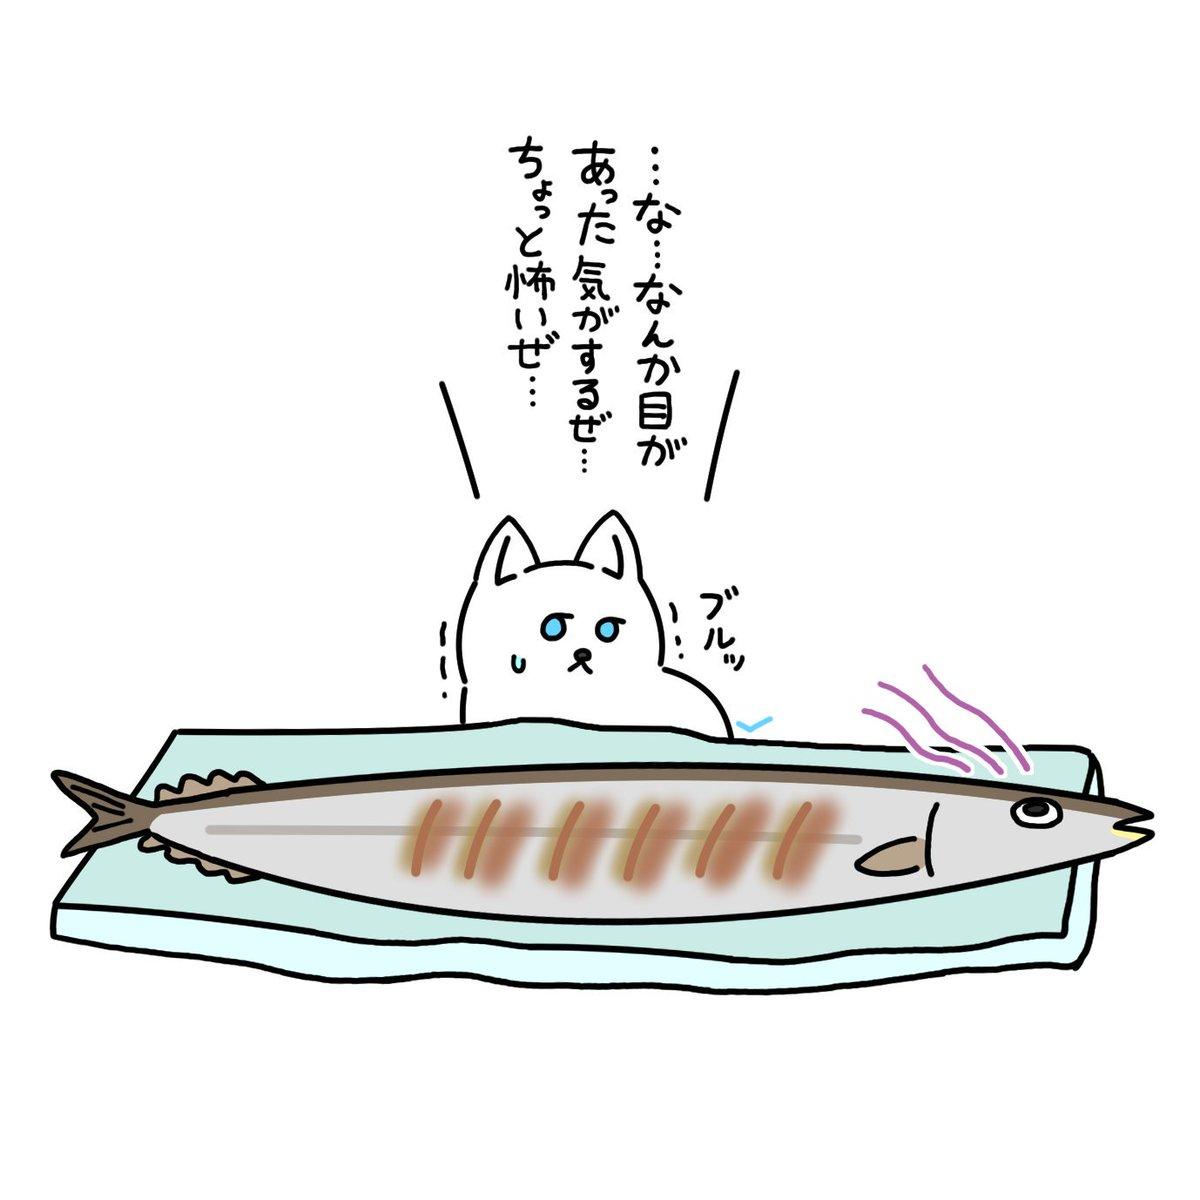 RT @doorfumi2018: 俺の食べっぷりを見てくれ #ドアふみ今日の迷走  イラスト @funakawana https://t.co/R68JLjVxZP